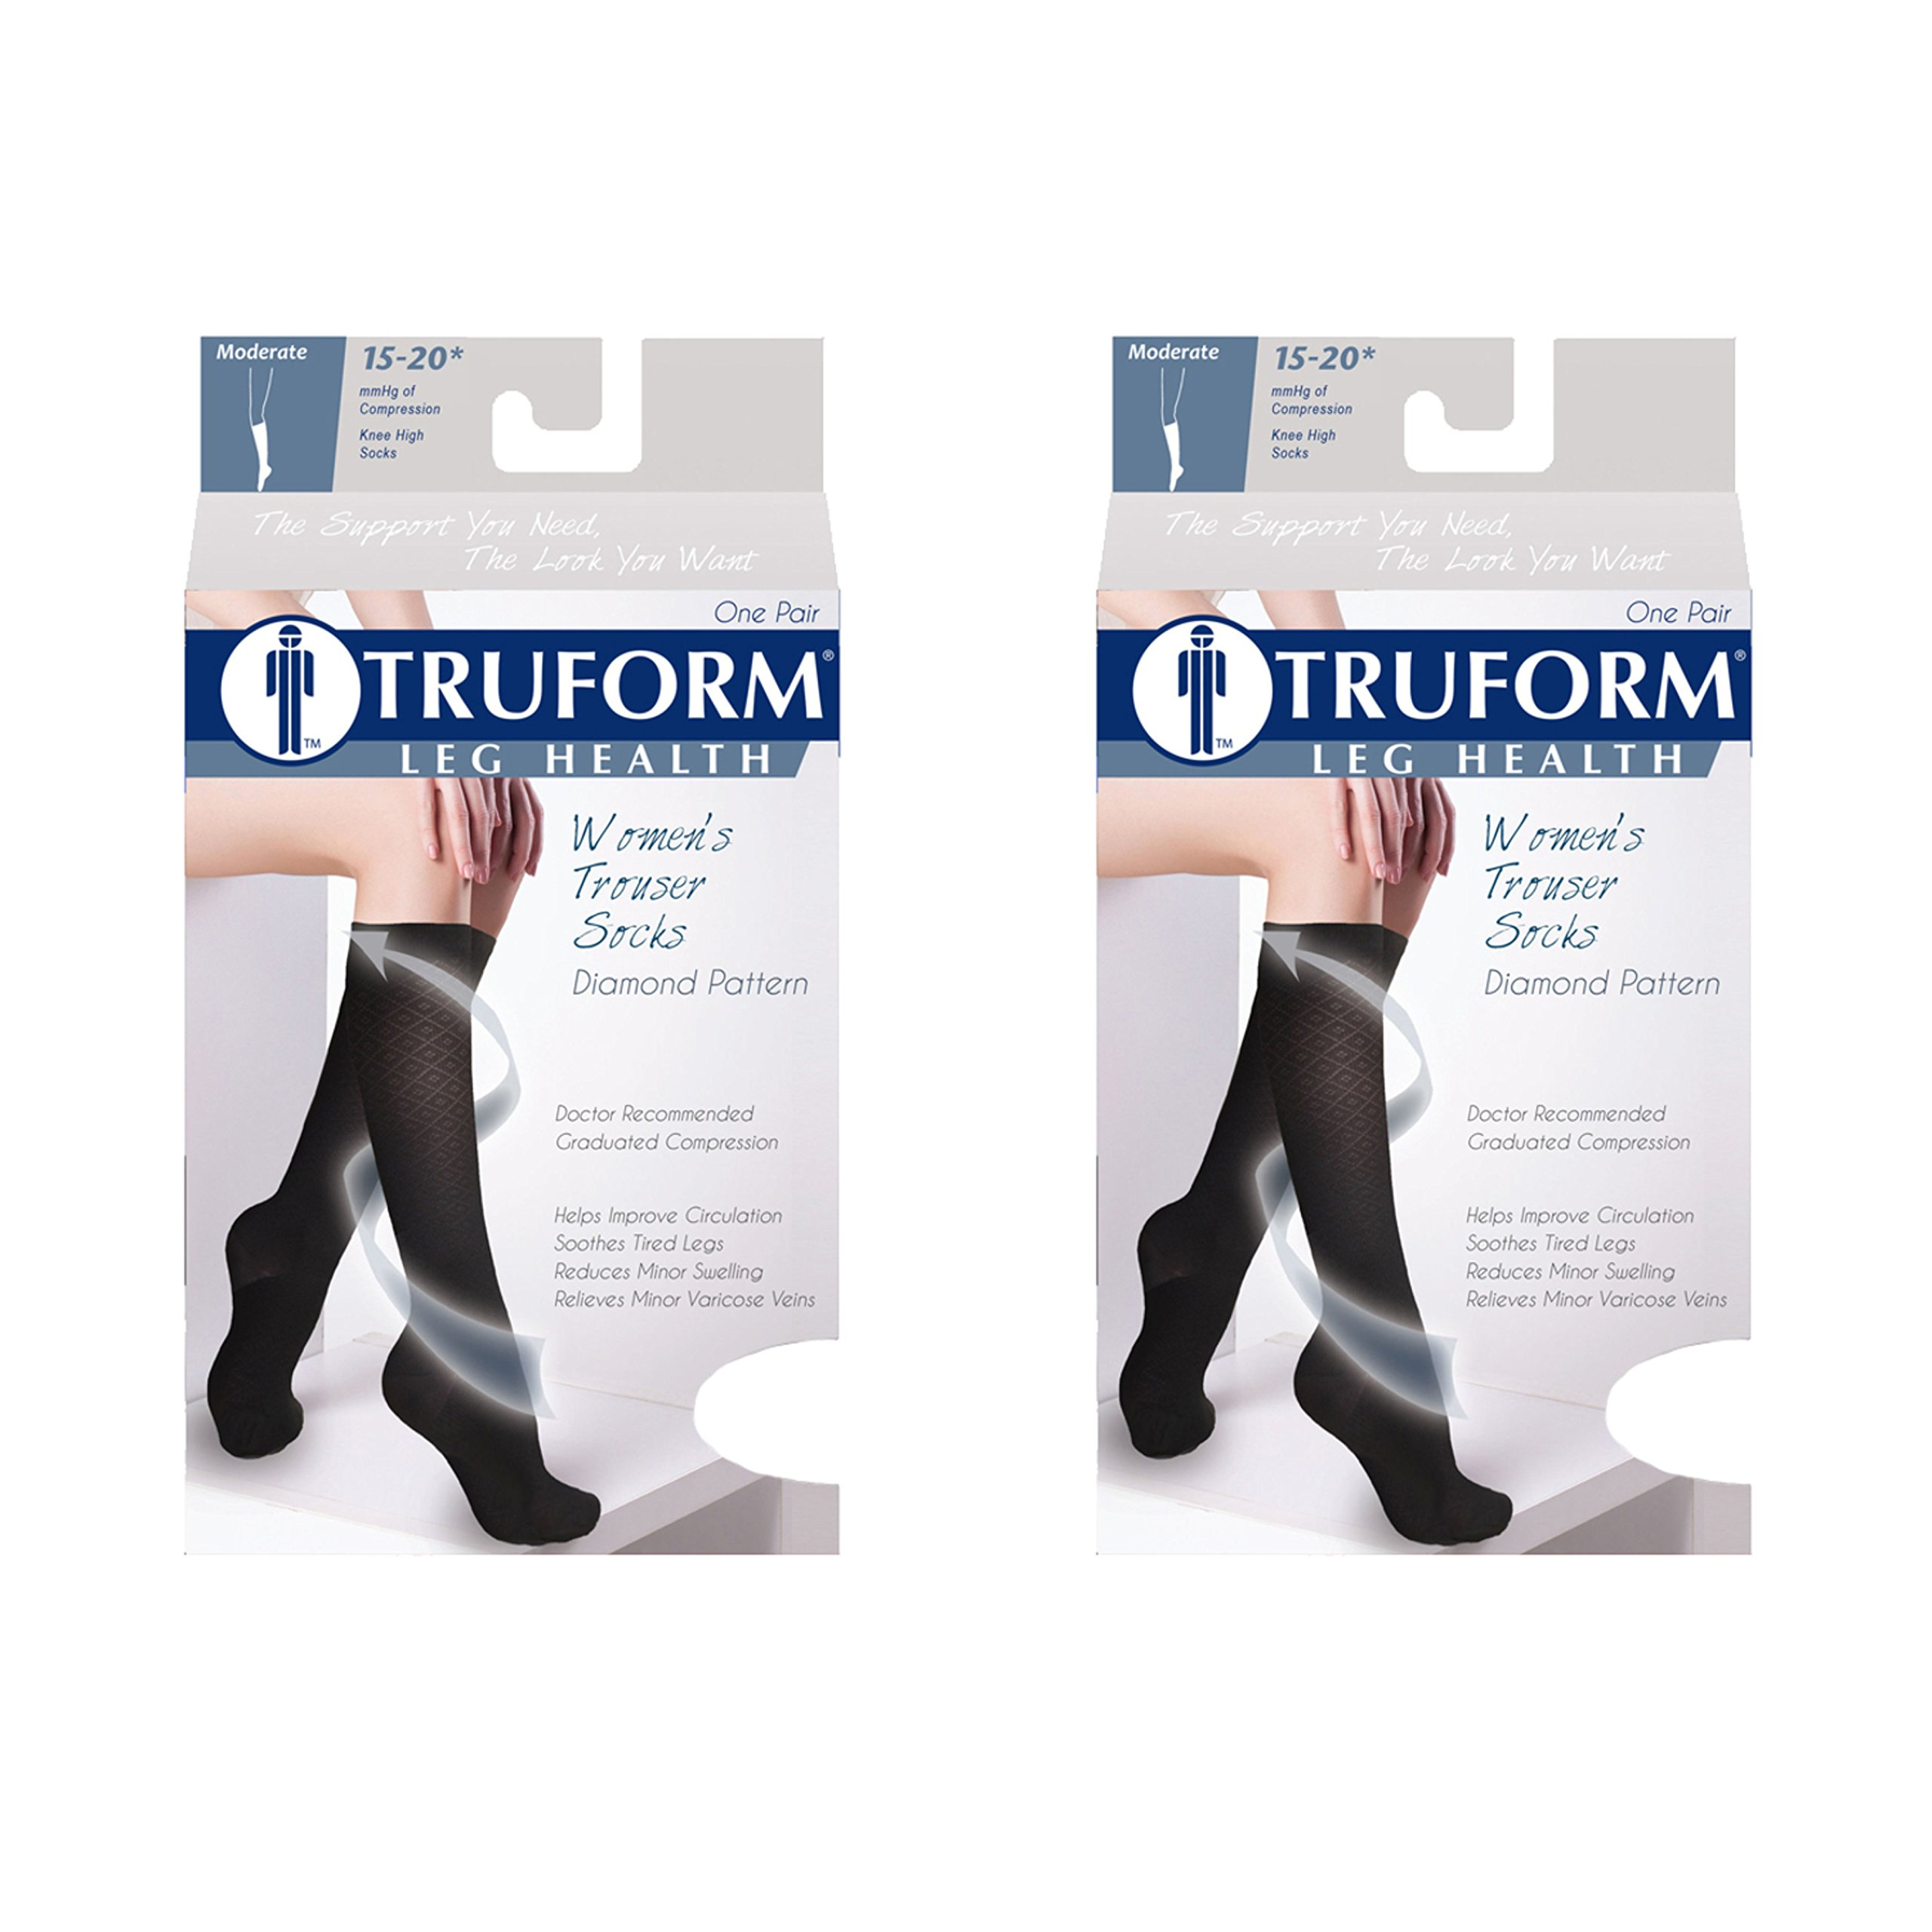 Truform Women's Fit Compression Socks, Diamond Knit Pattern, 15-20 mmHg, Black, Large (Pack of 2)